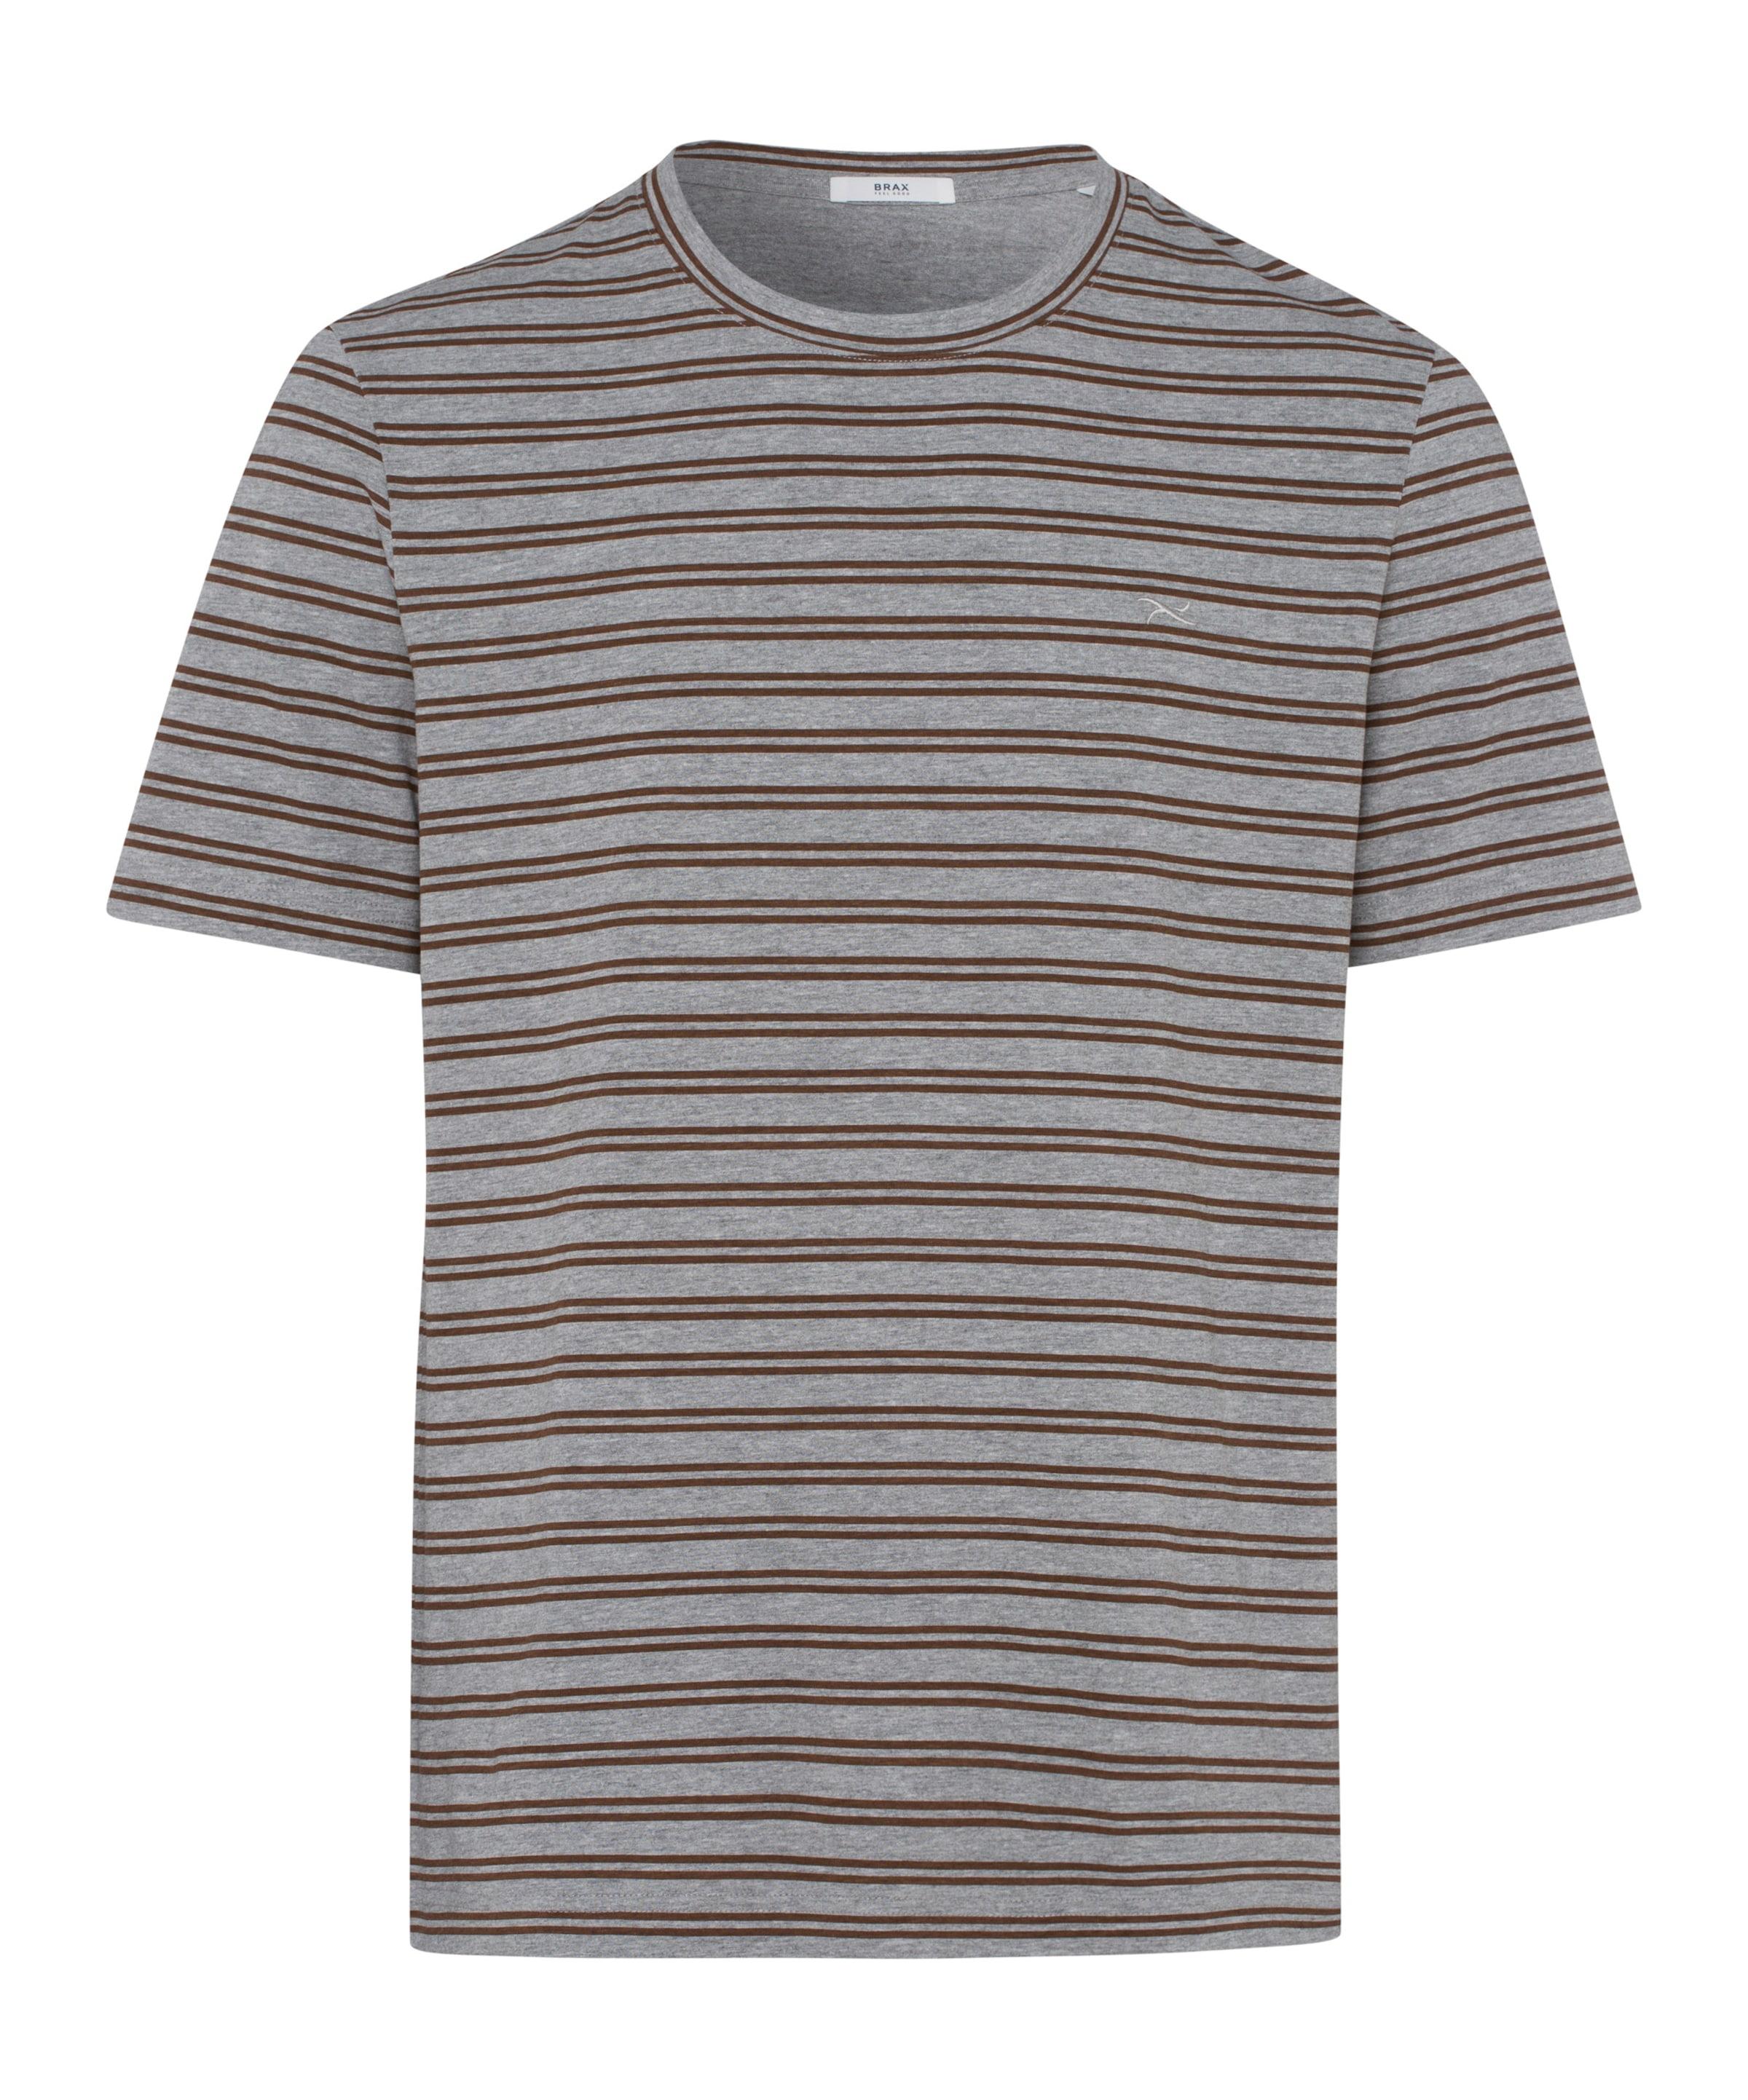 shirt In T 'troy' BraunGrau Brax ZuwkOPXiT